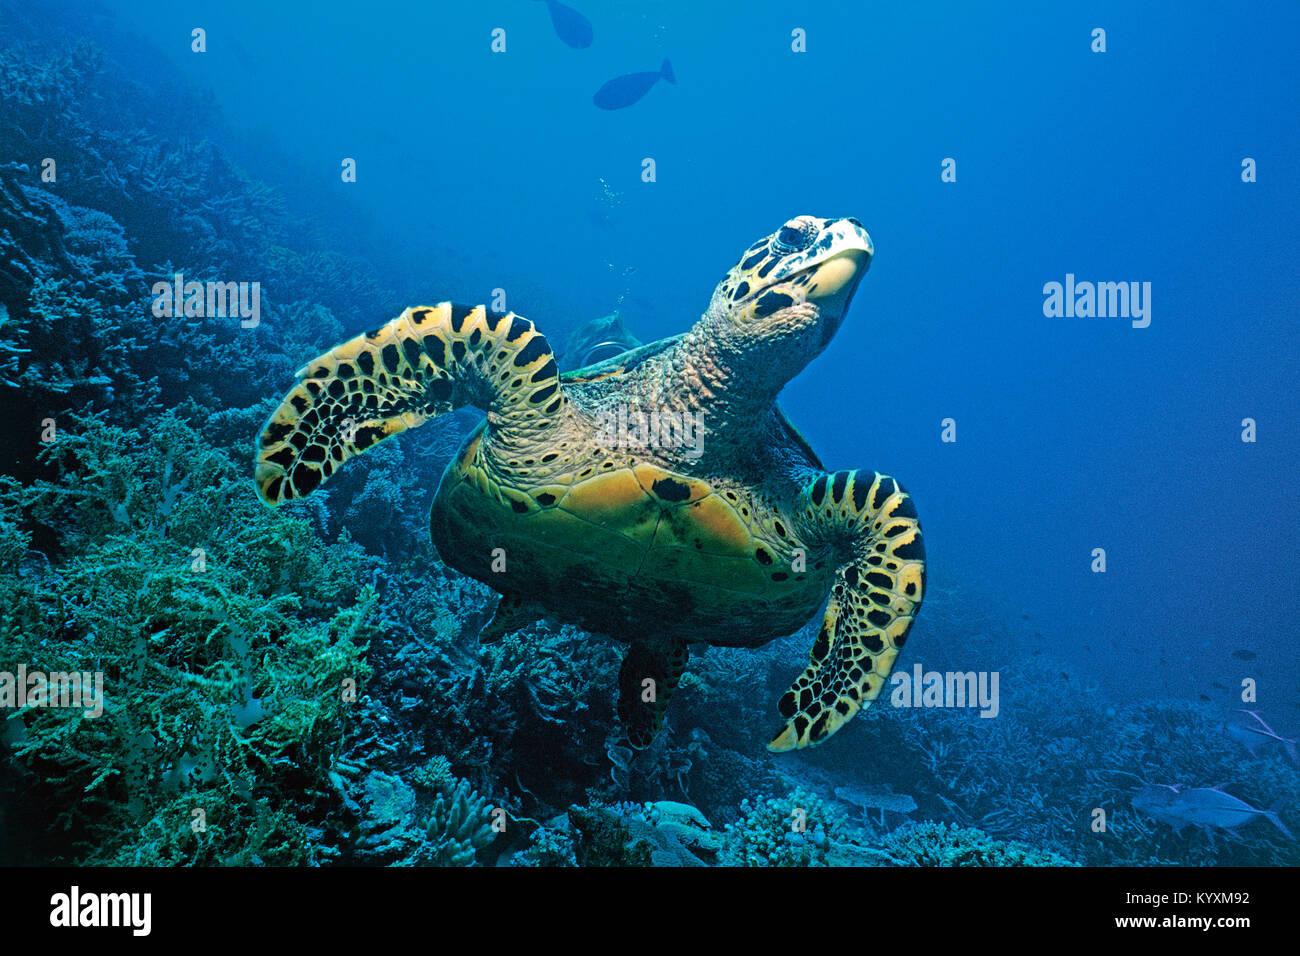 Tartaruga embricata (Eretmochelys imbricata), isole delle Maldive, Oceano Indiano, Asia Immagini Stock